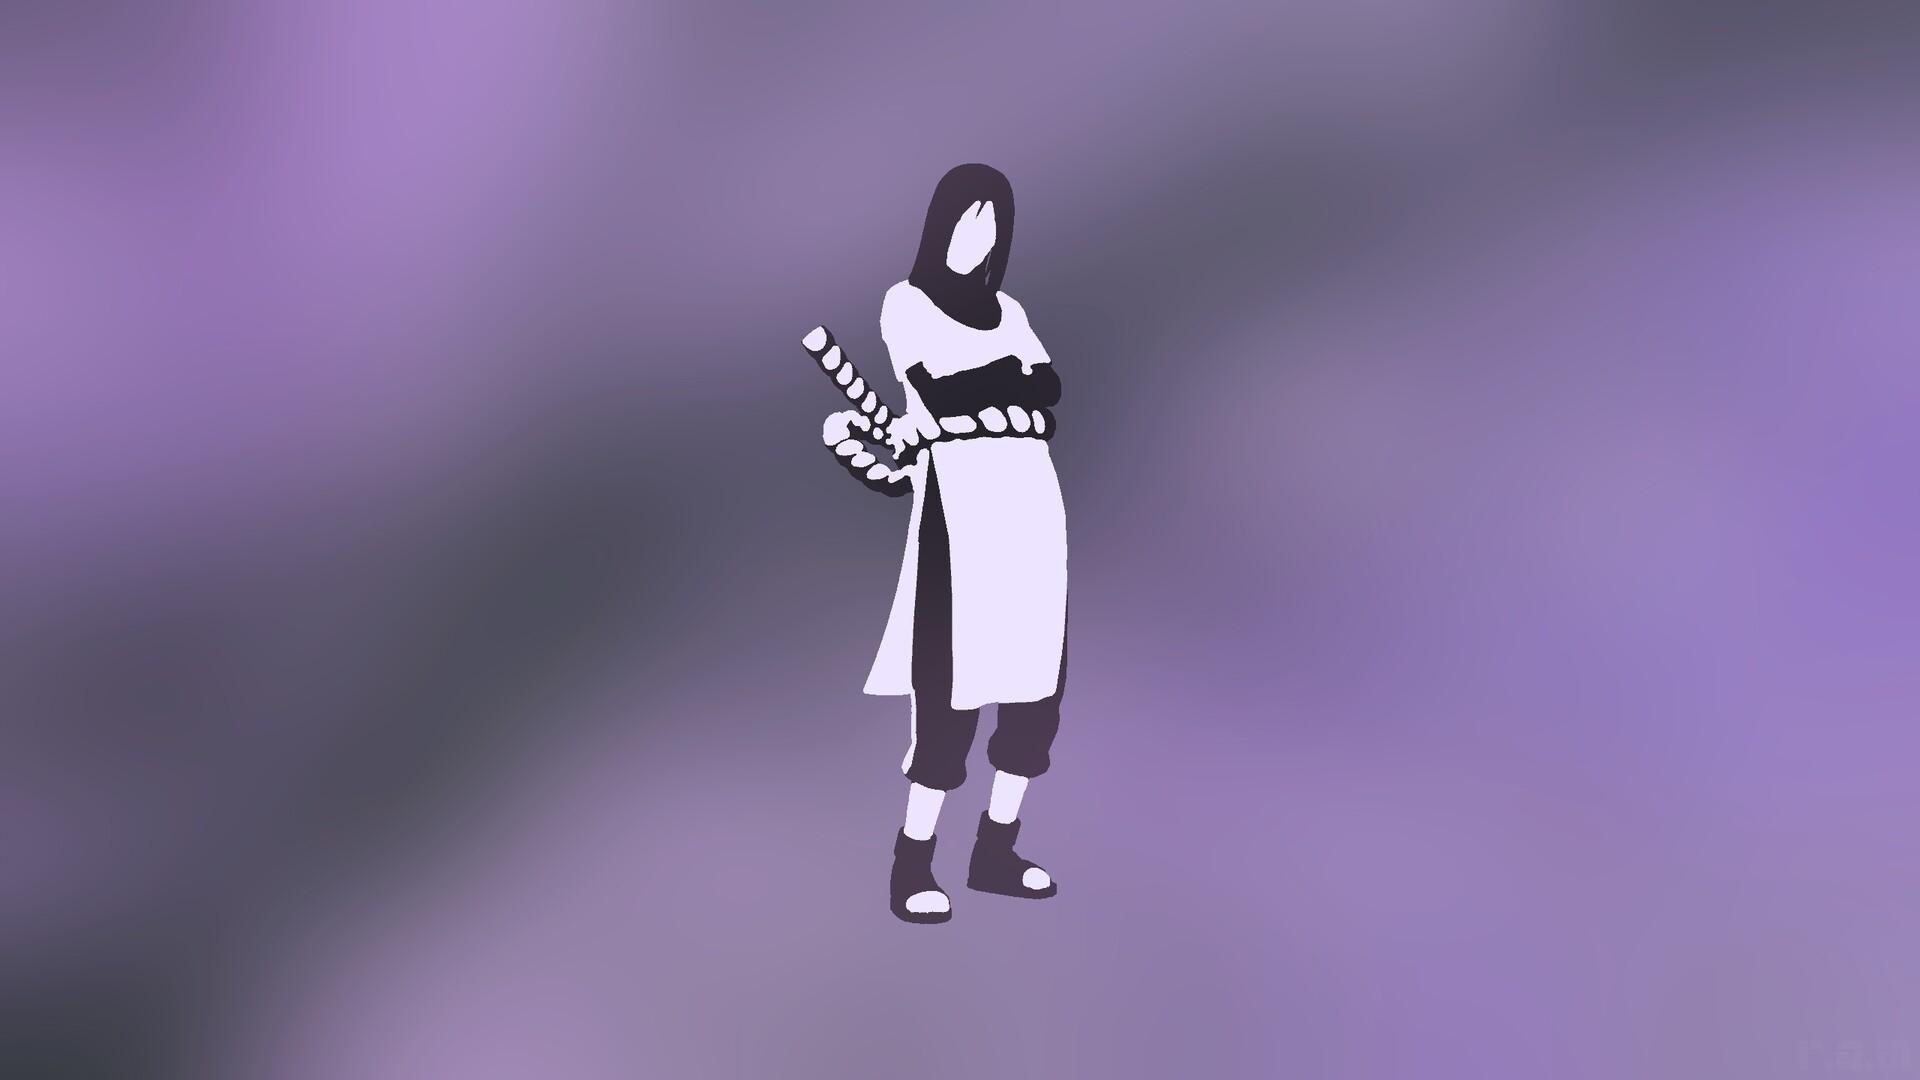 Orochimaru full screen hd wallpaper